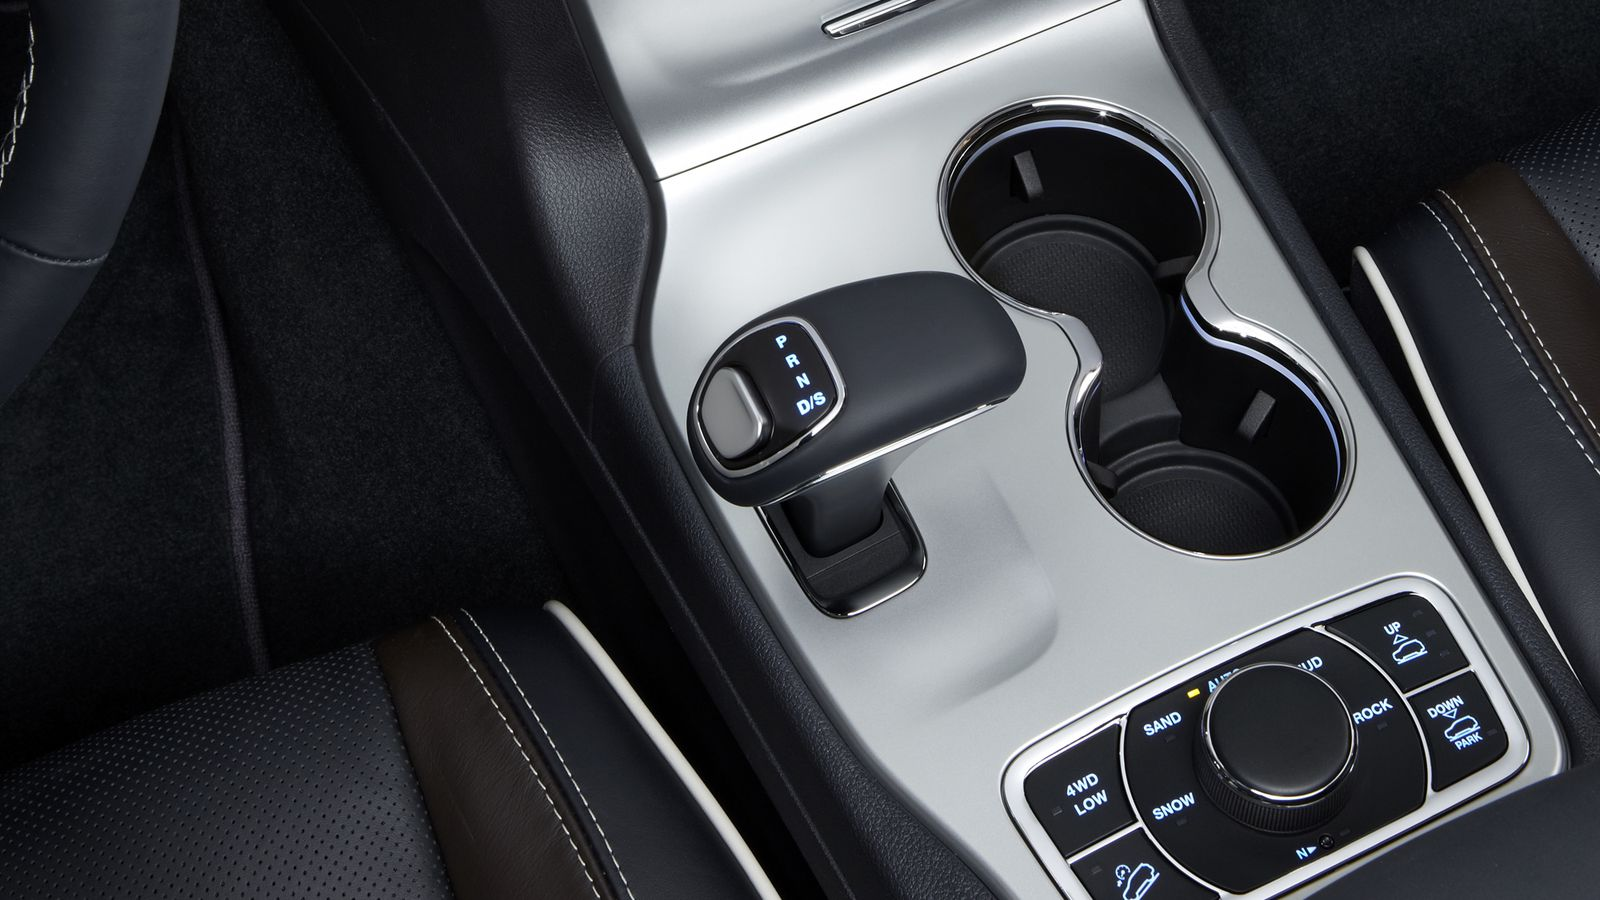 fiat chrysler  recalling  million cars   weird electronic shift levers  verge